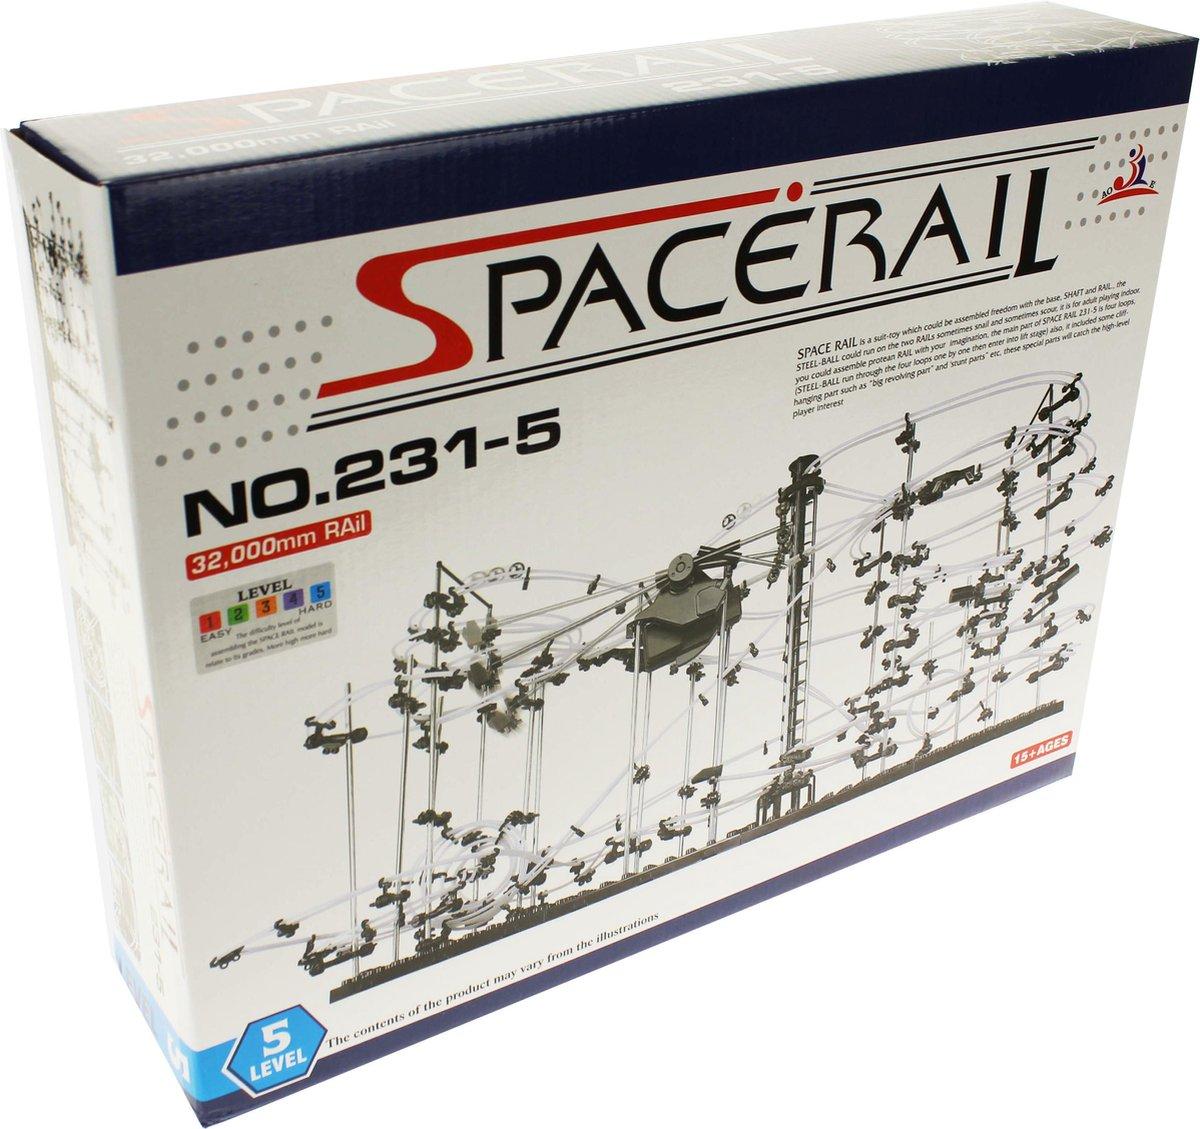 United Entertainment - Spacerail Knikker Achtbaan - Level 5